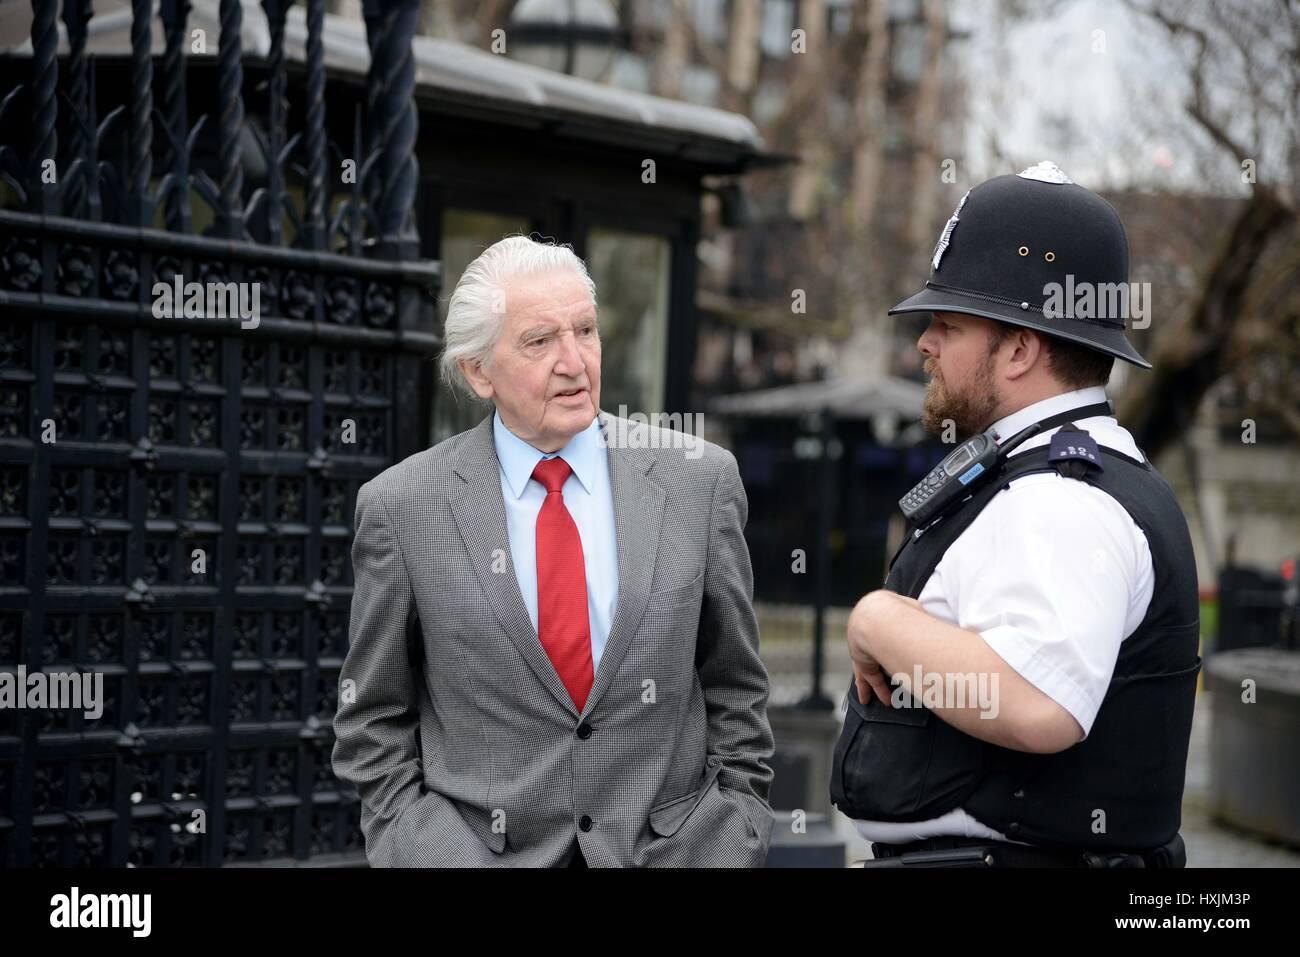 Dennis Skinner MP, Credit: Finnbarr Webster/Alamy Live News - Stock Image